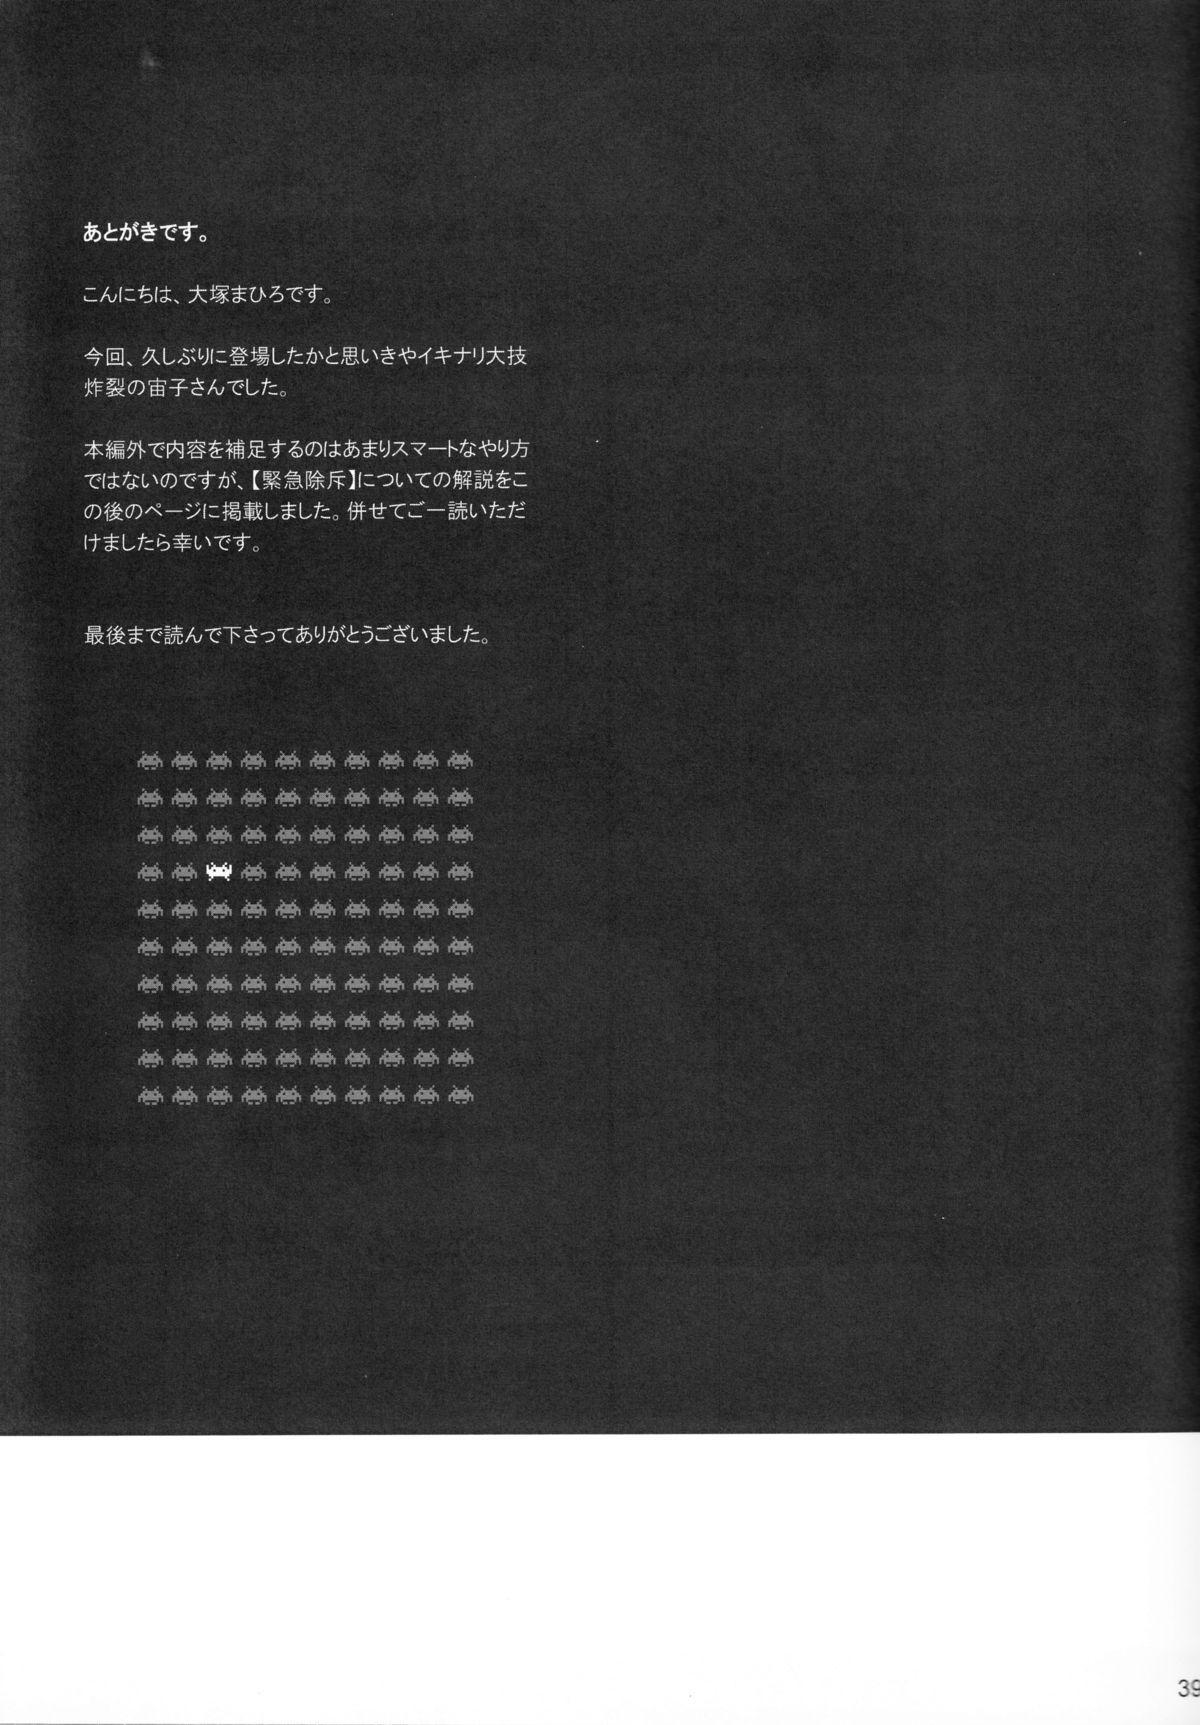 Sorako no Tabi 6 37